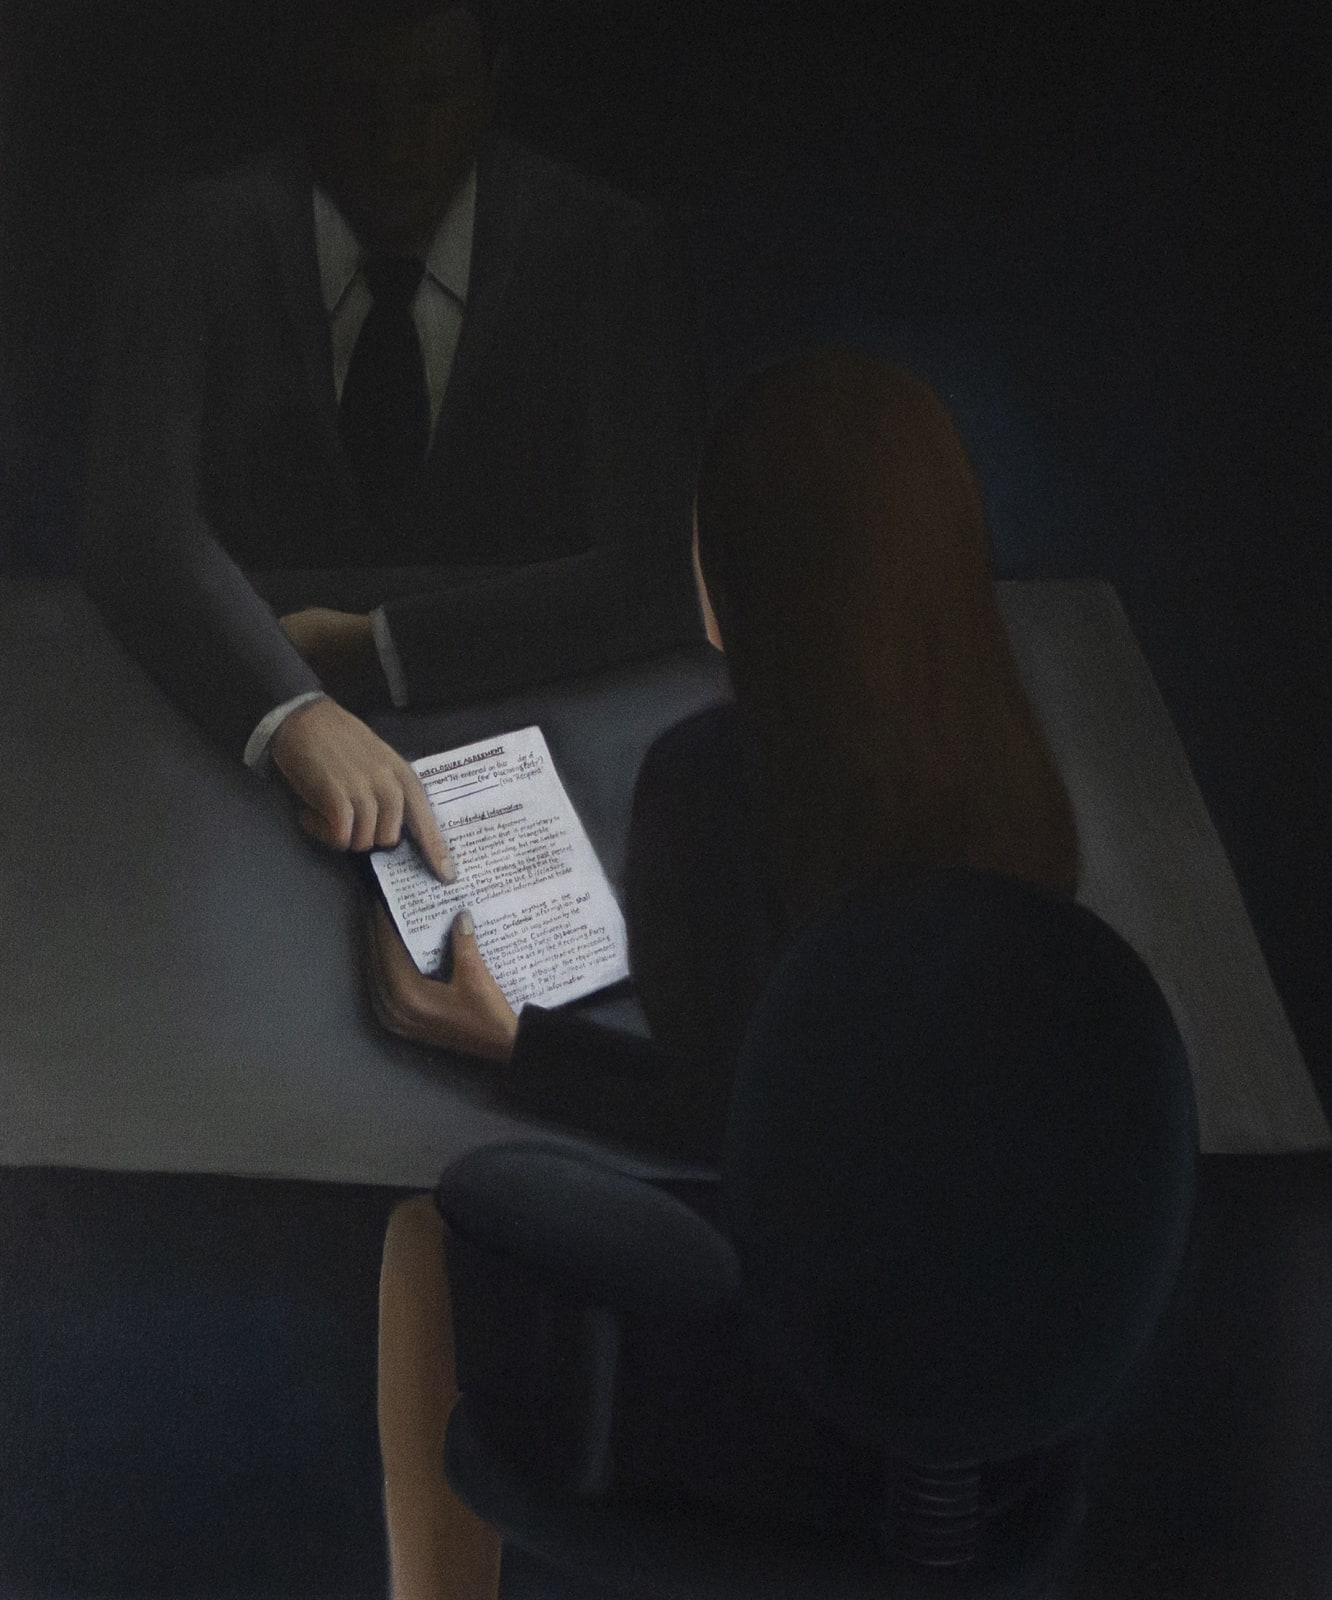 Vannessa Gully Santiago, NDA, 30 x 36 inches, Oil on Canvas,2020